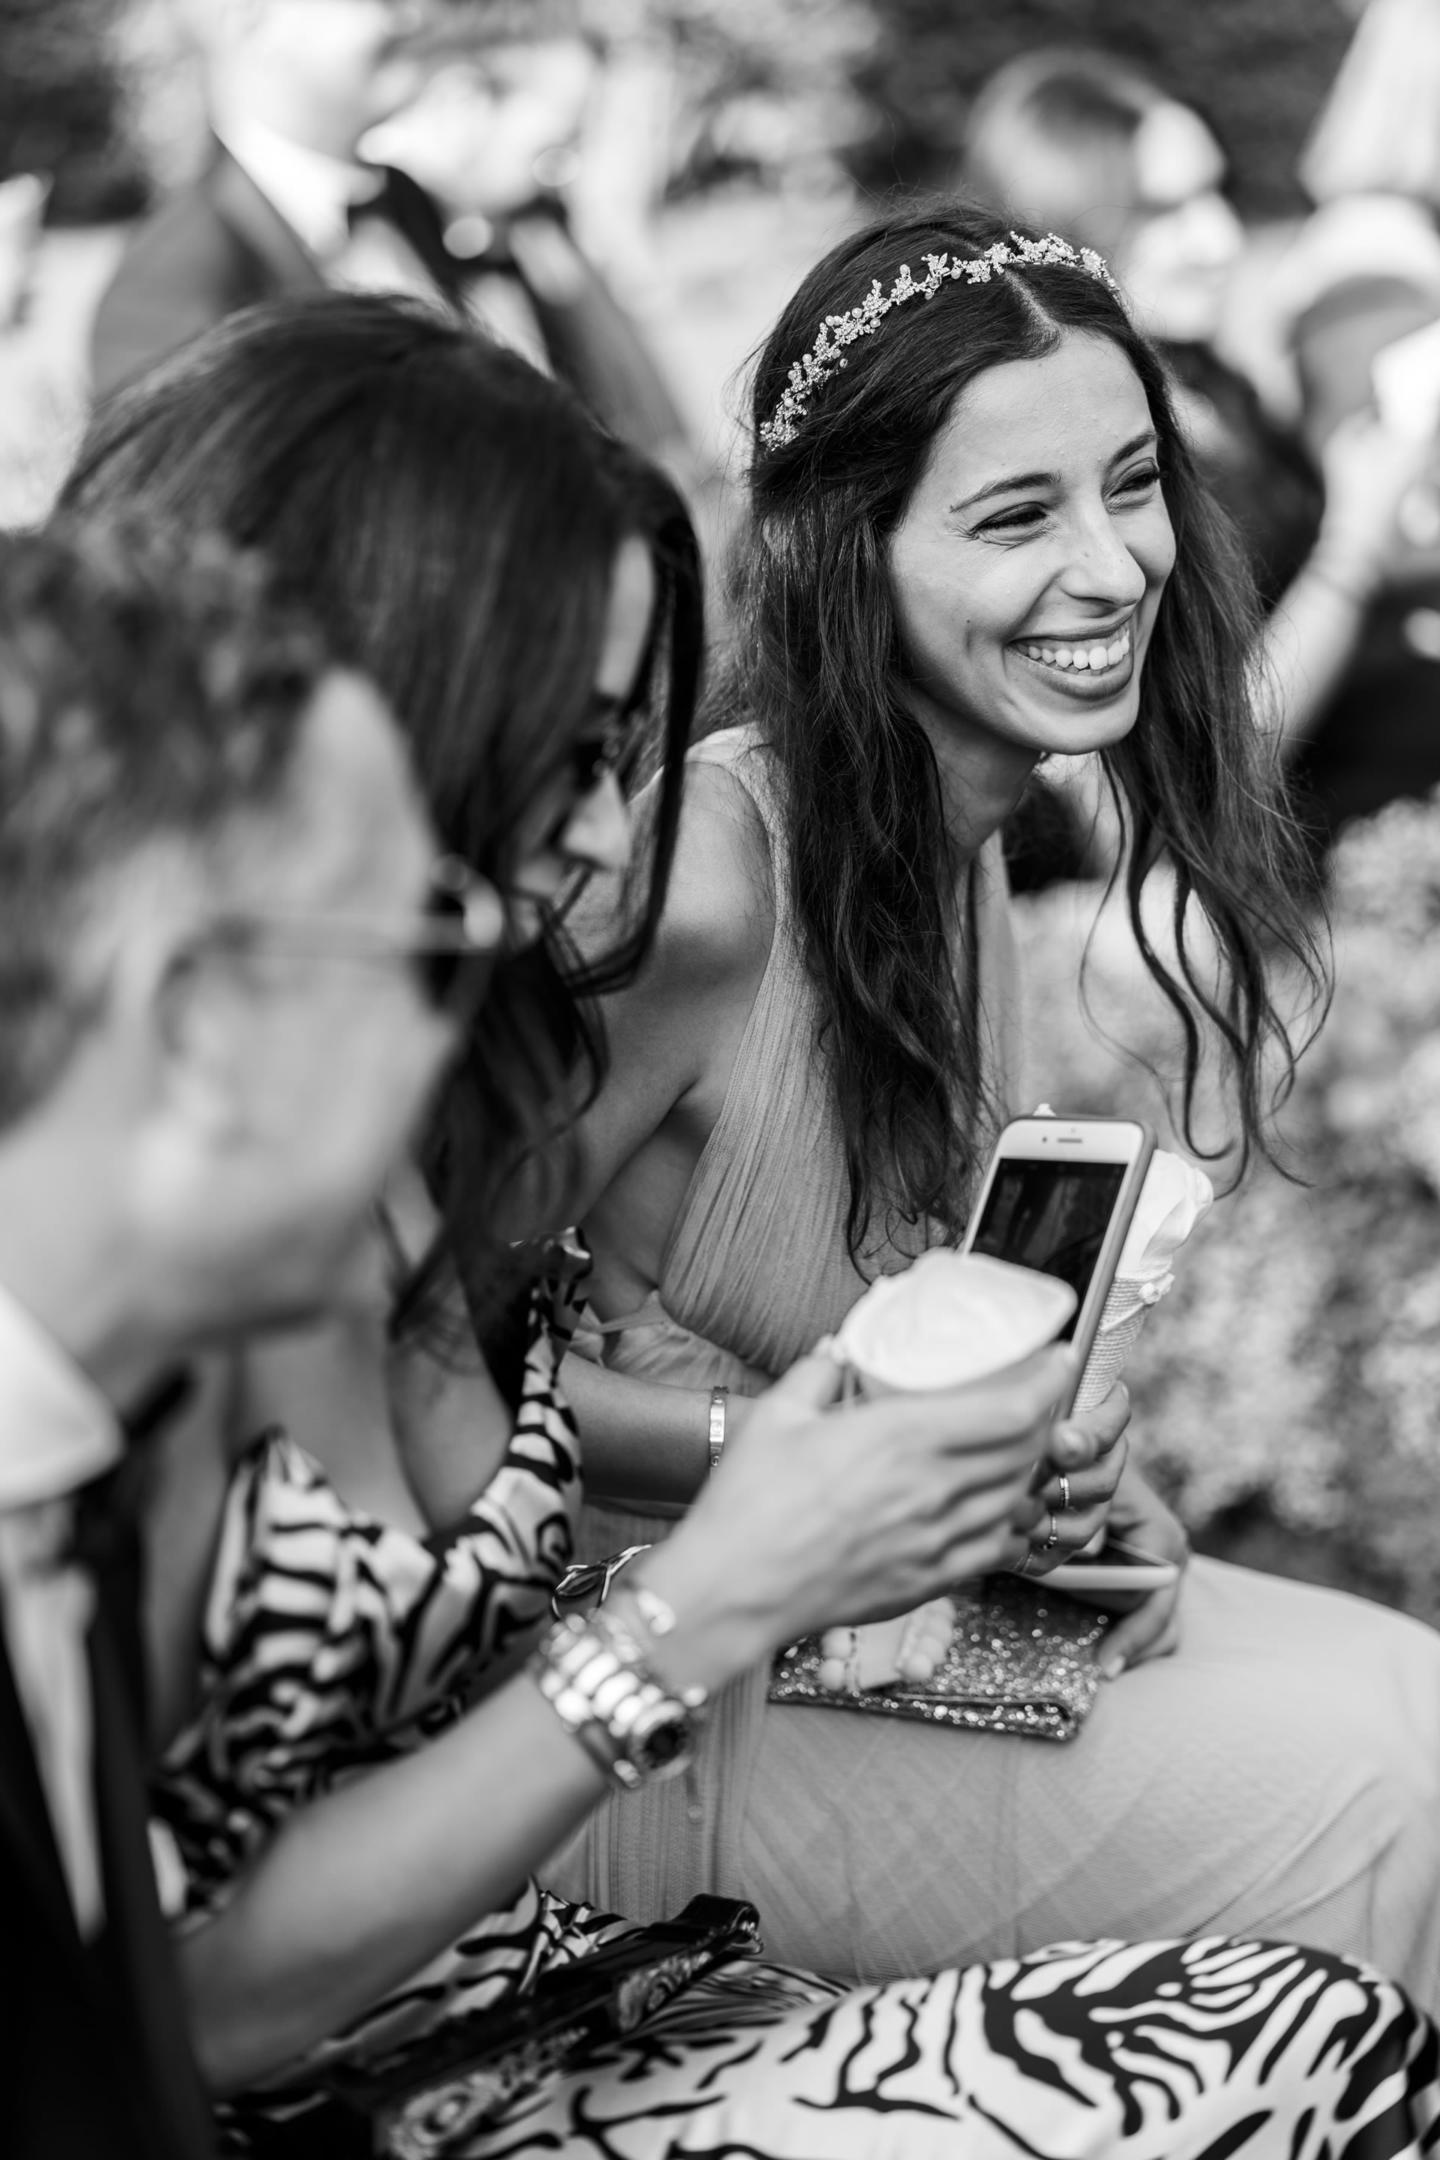 - 68 :: A spectacular wedding: mother Russia on Como lake :: Luxury wedding photography - 67 ::  - 68